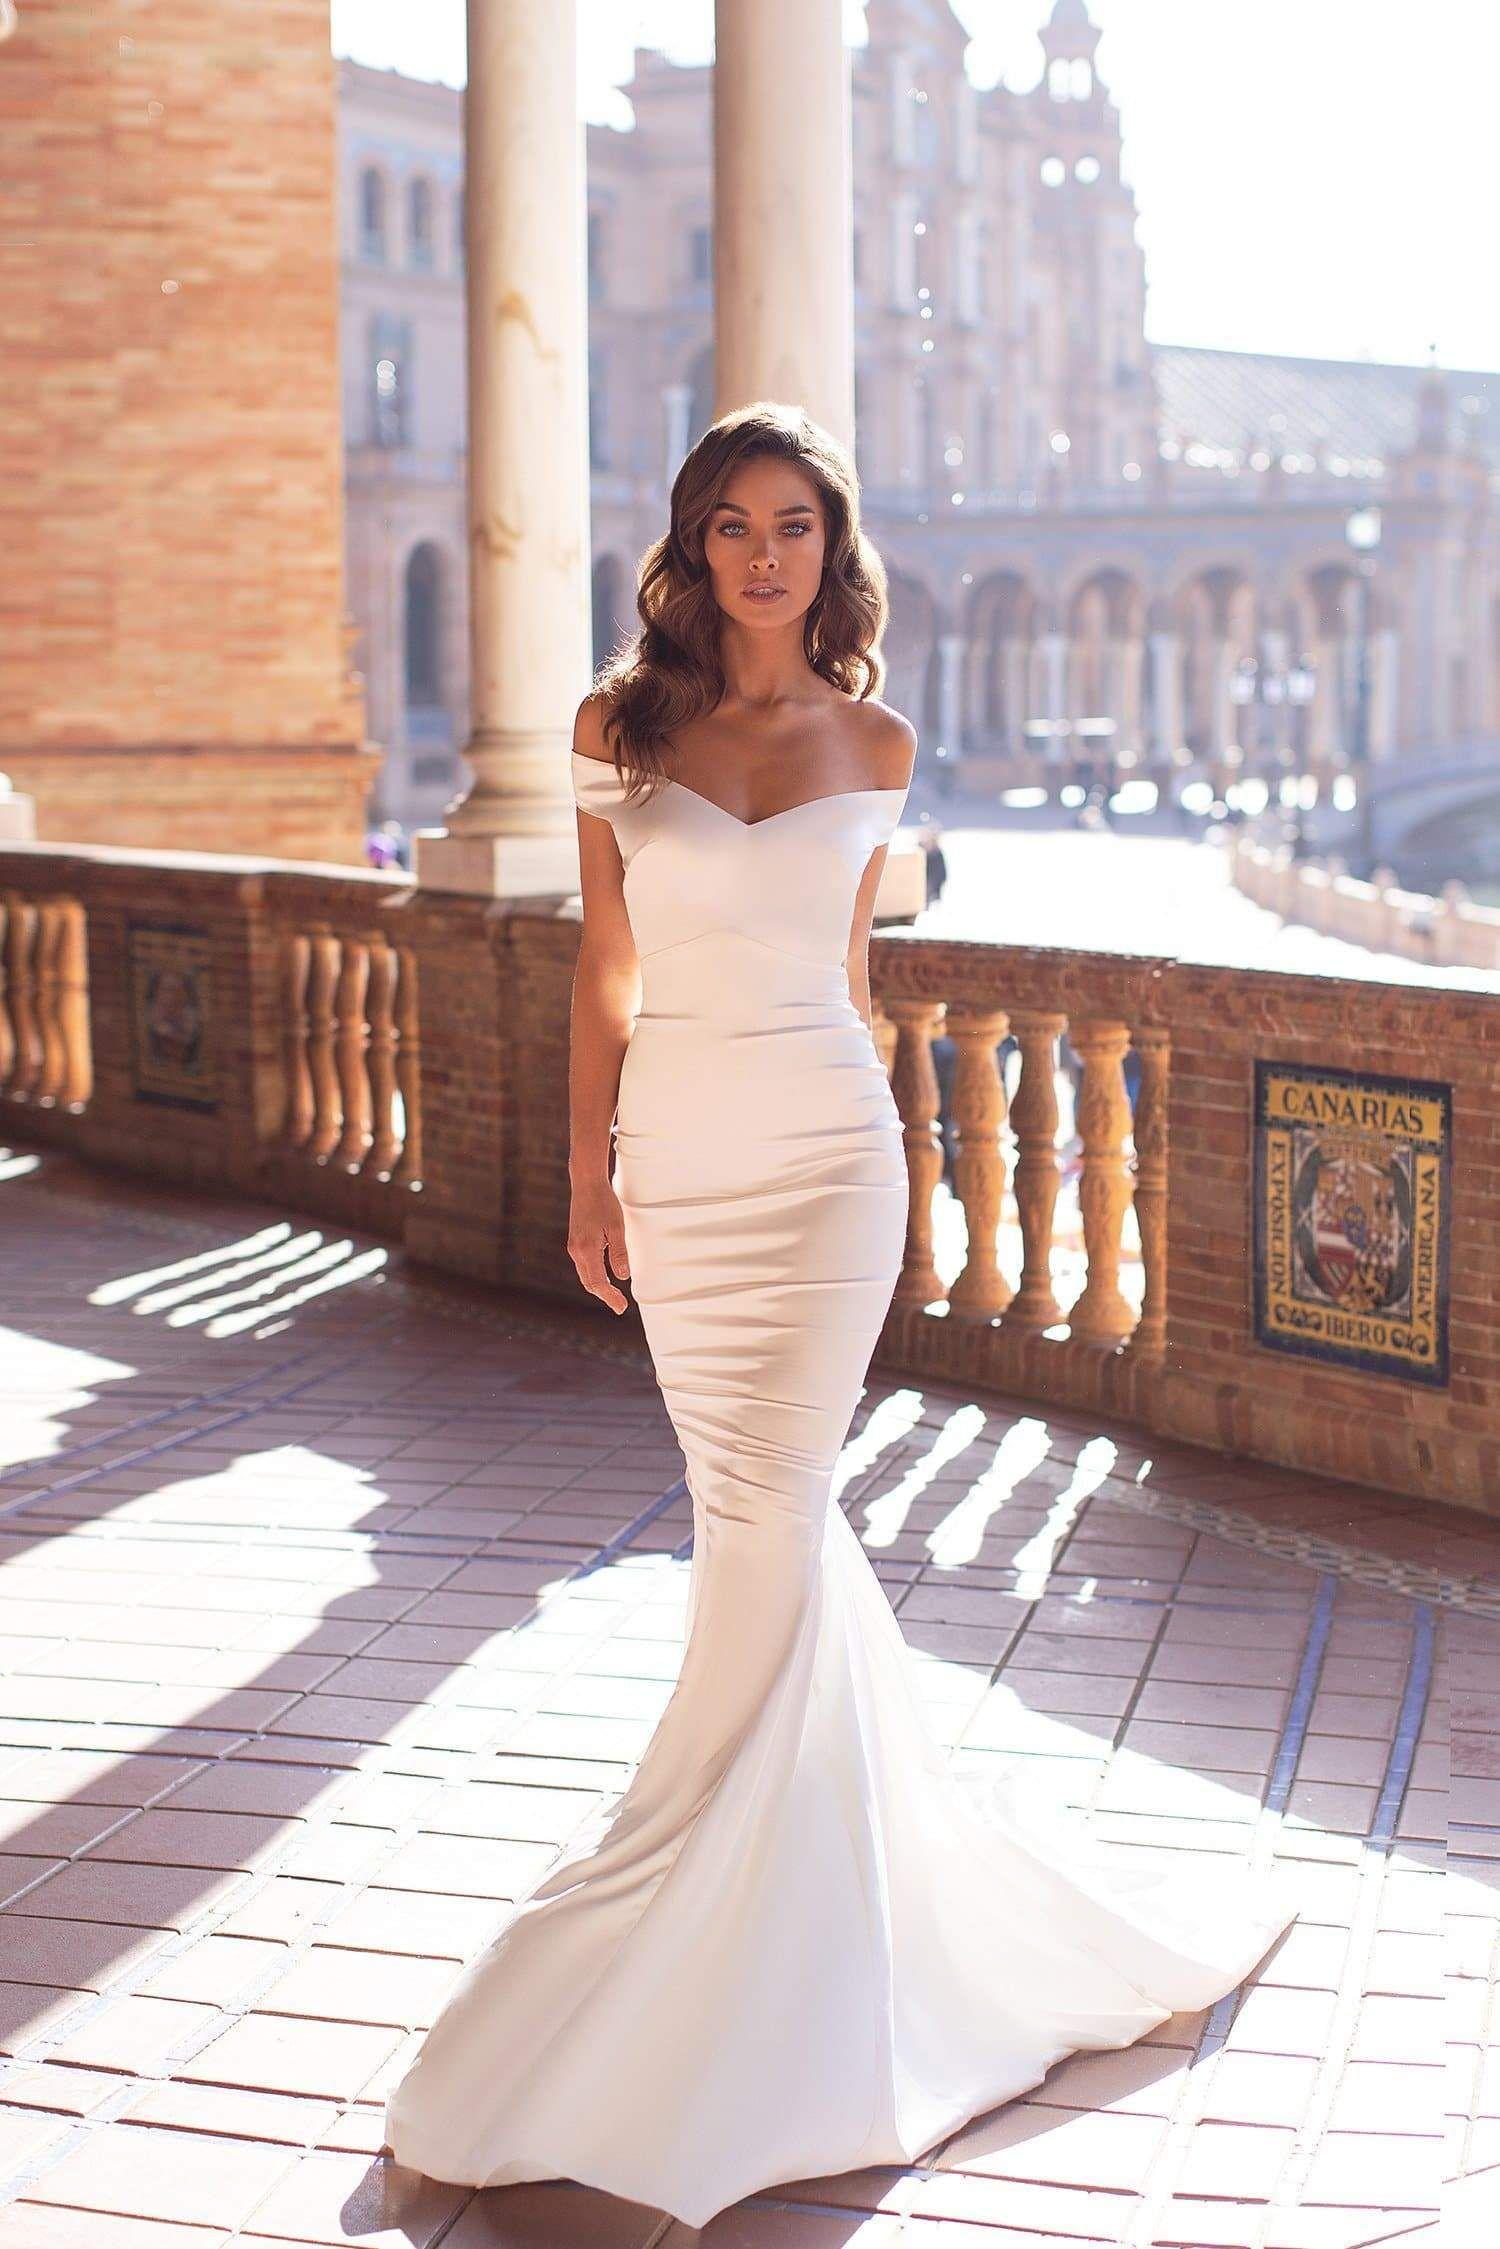 Dulce White Tight Wedding Dress Off Shoulder Wedding Dress Wedding Dresses Lace [ 2249 x 1500 Pixel ]